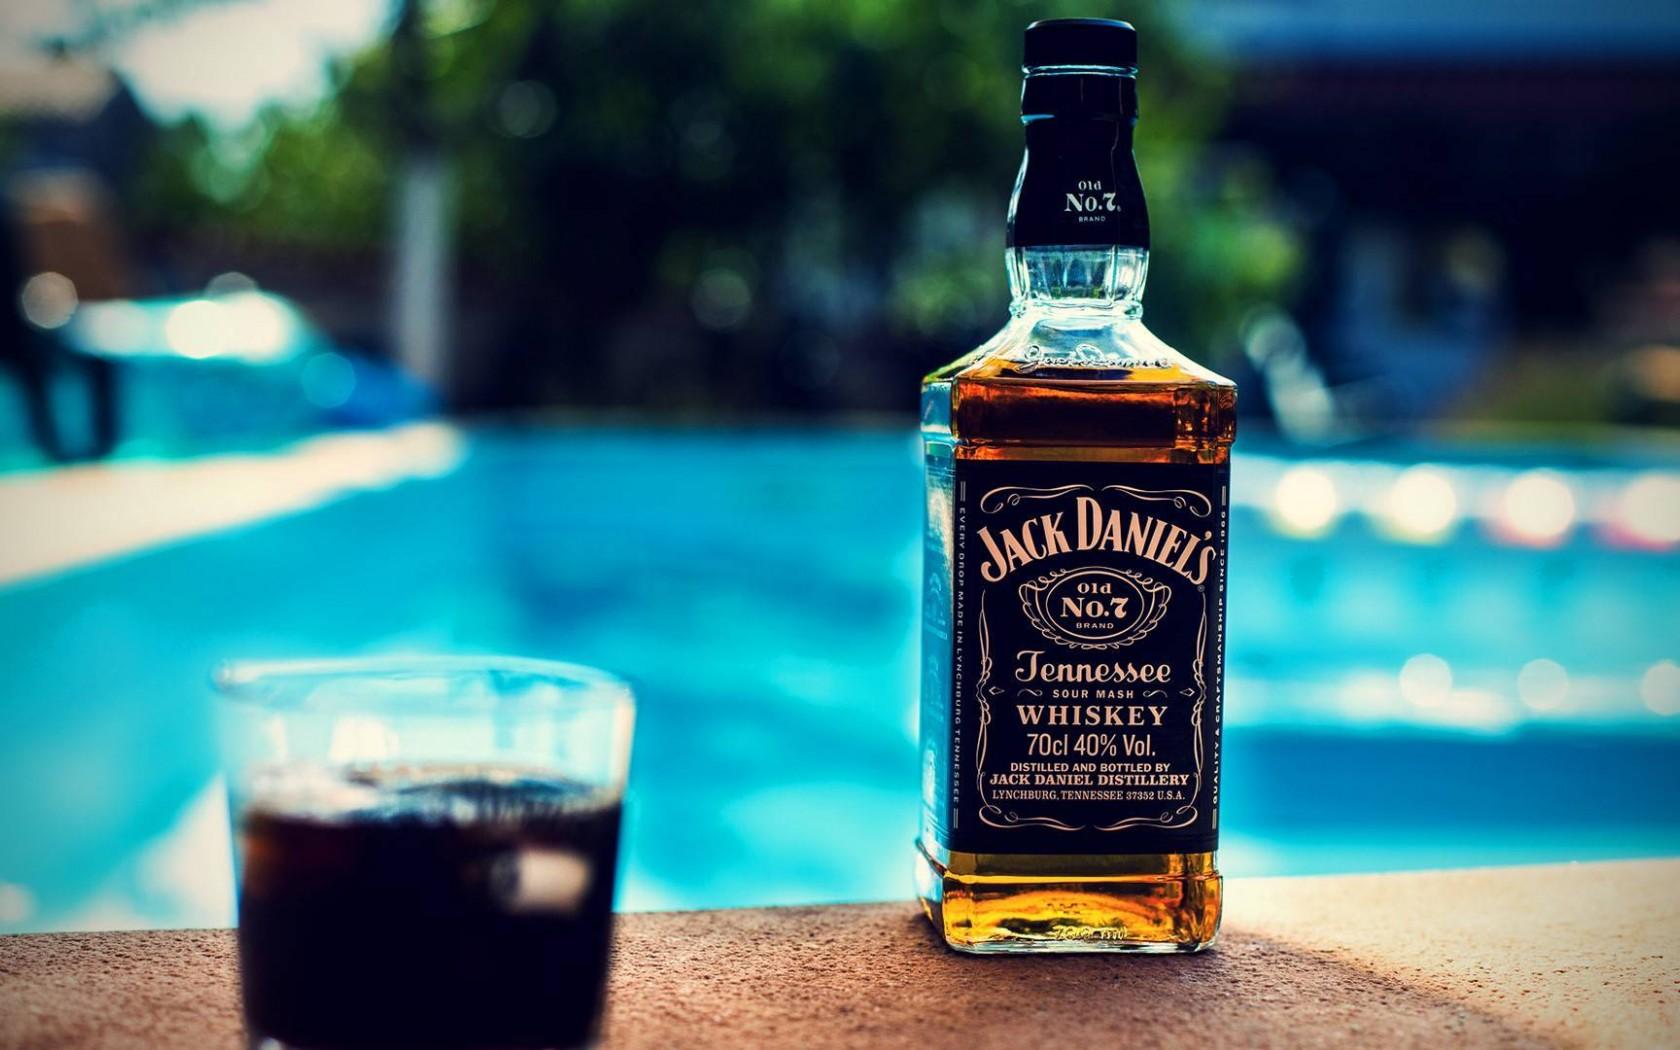 consumo de alcohol responsable